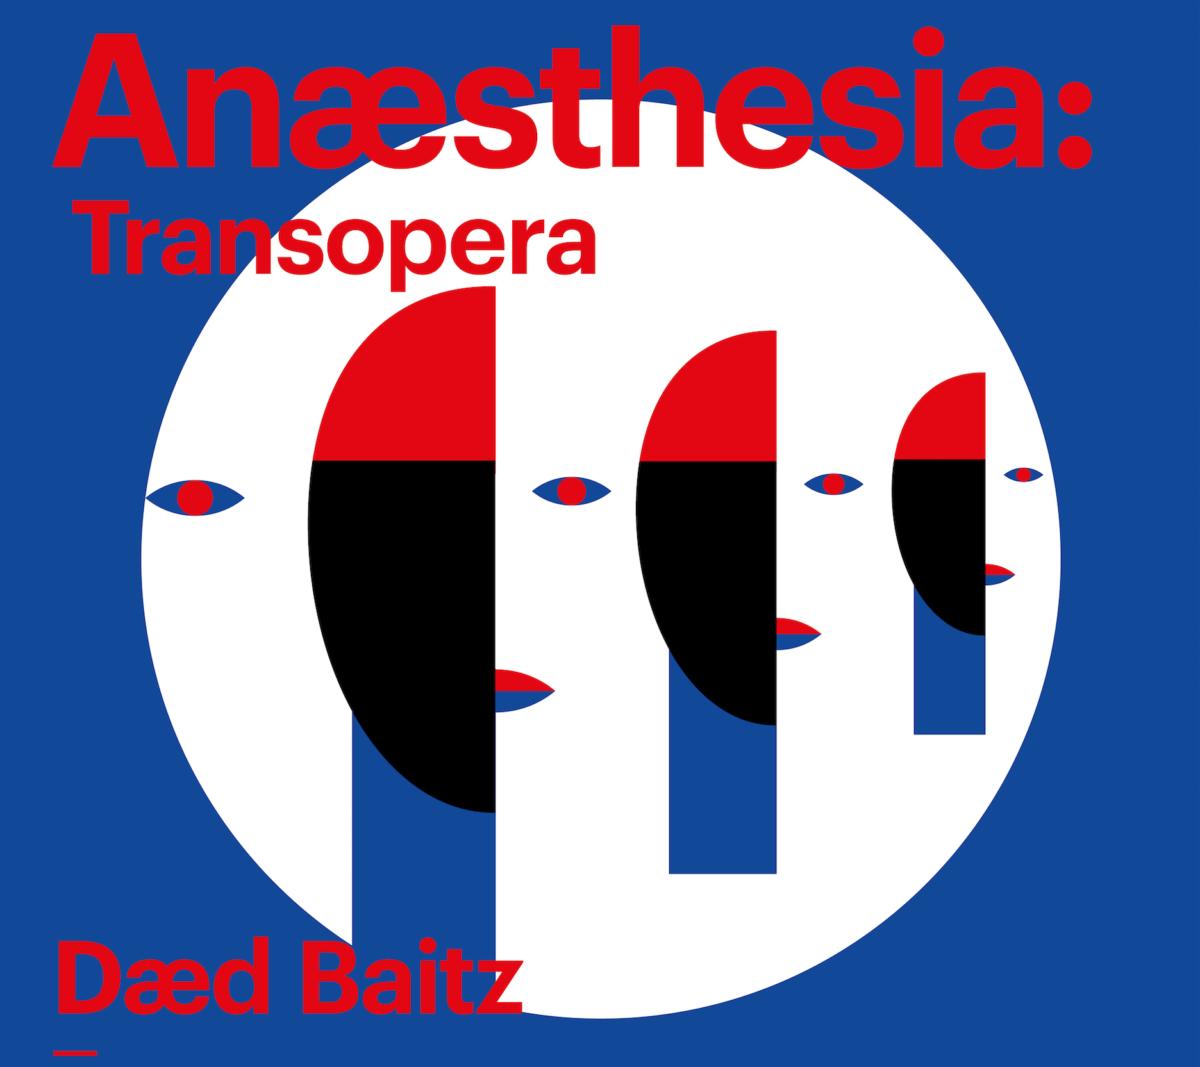 Anaesthesia: experimental transopera